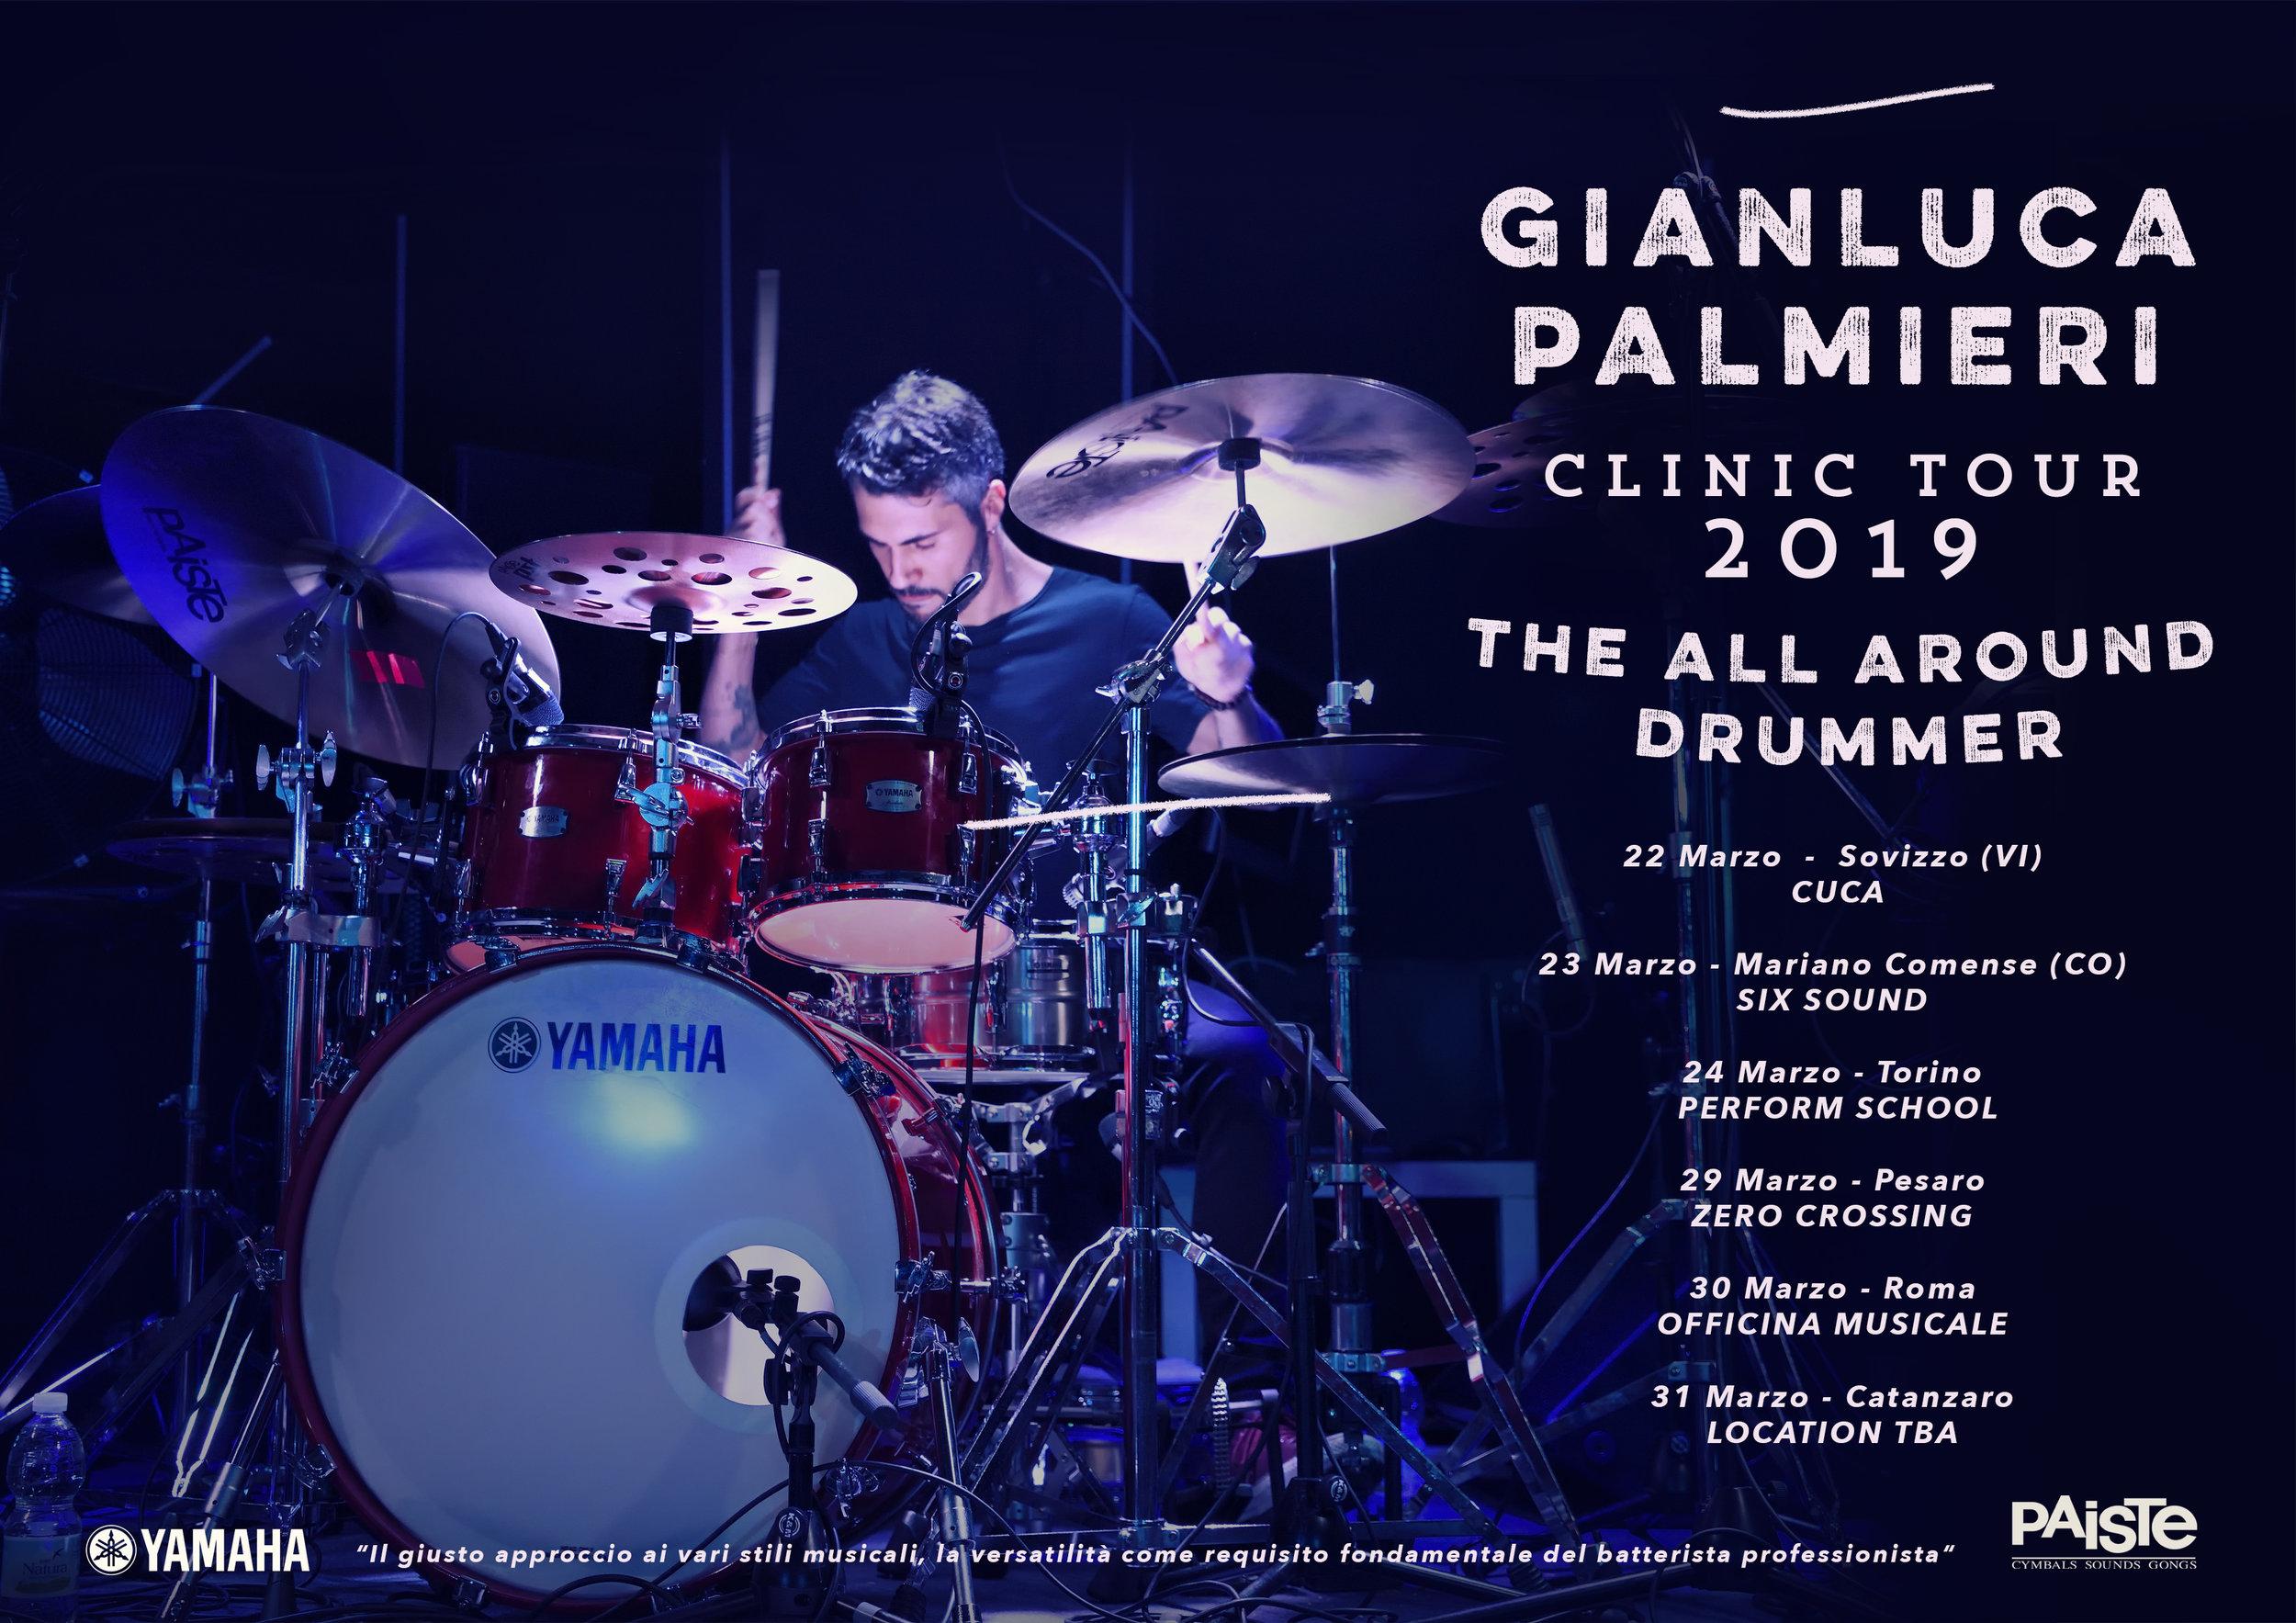 G_palmieri Clinic_date.jpg